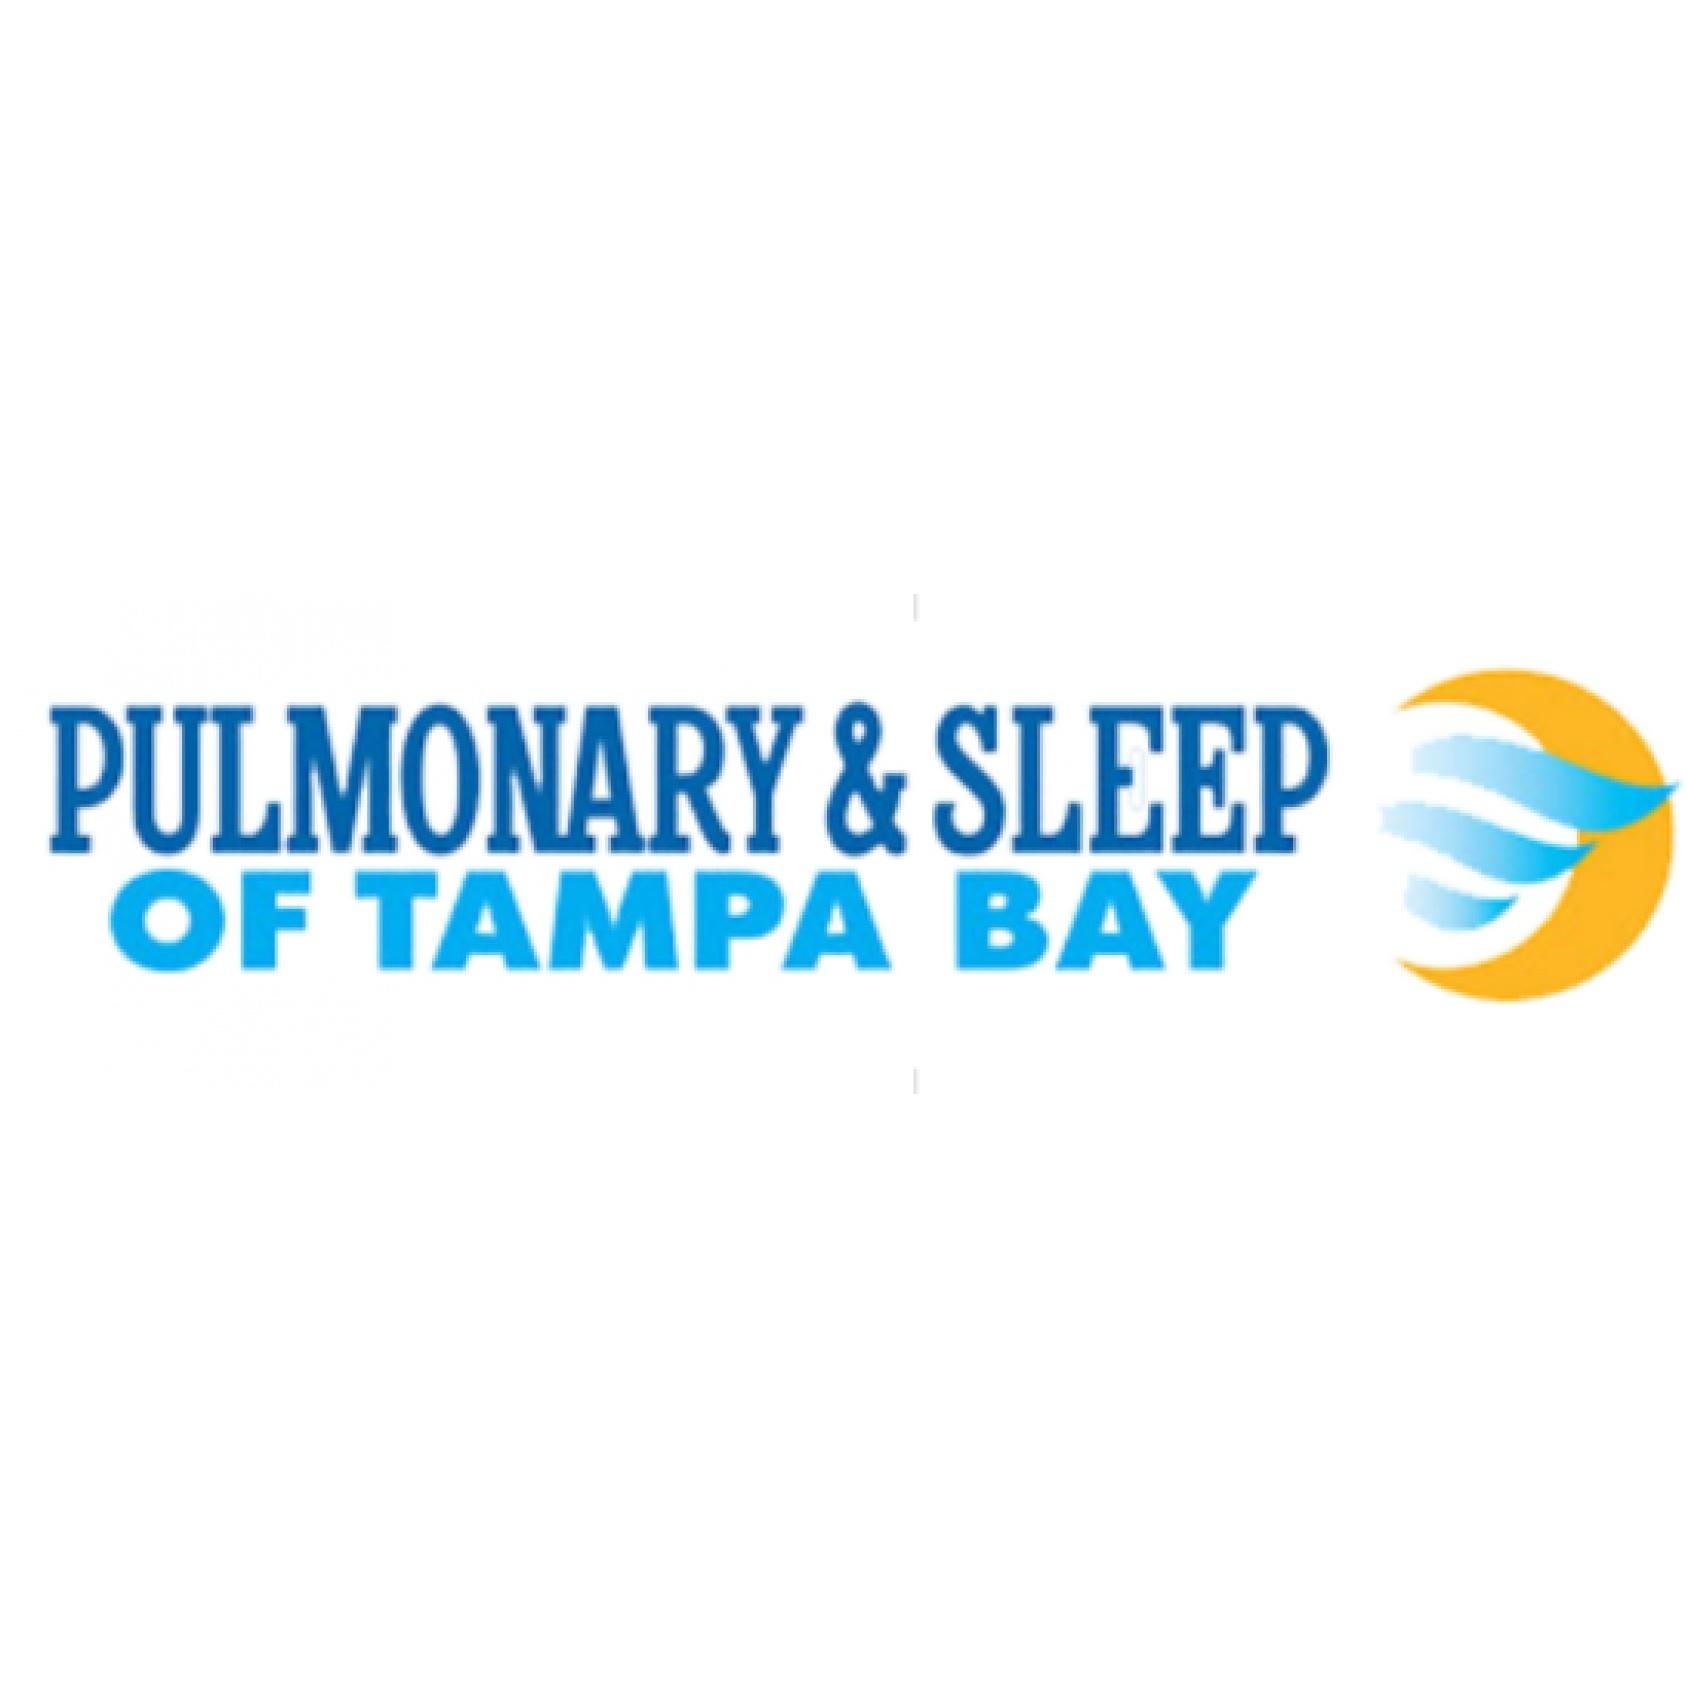 Pulmonary & Sleep Of Tampa Bay